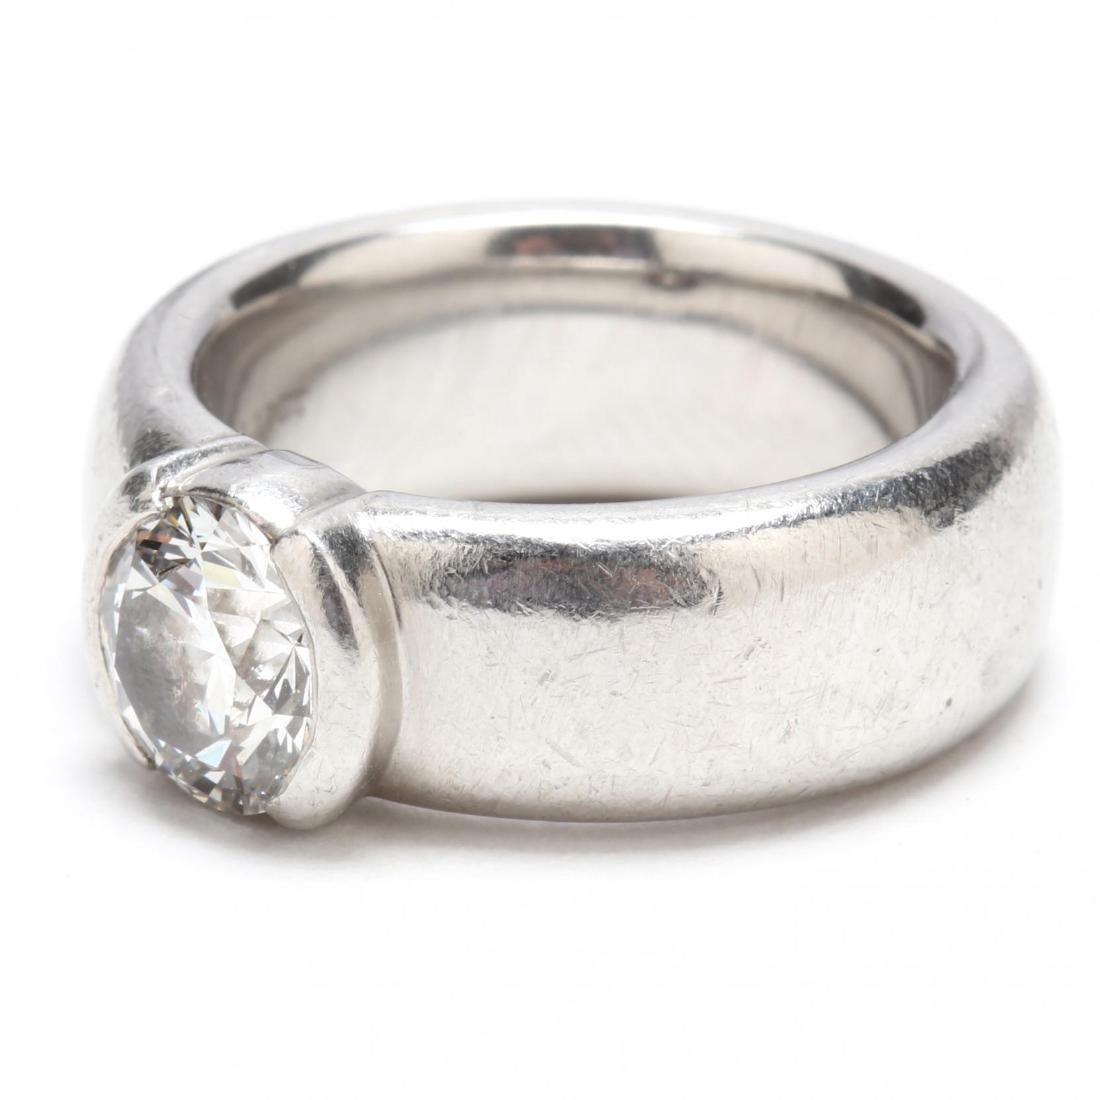 Platinum and Diamond Ring, Tiffany & Co. - 4